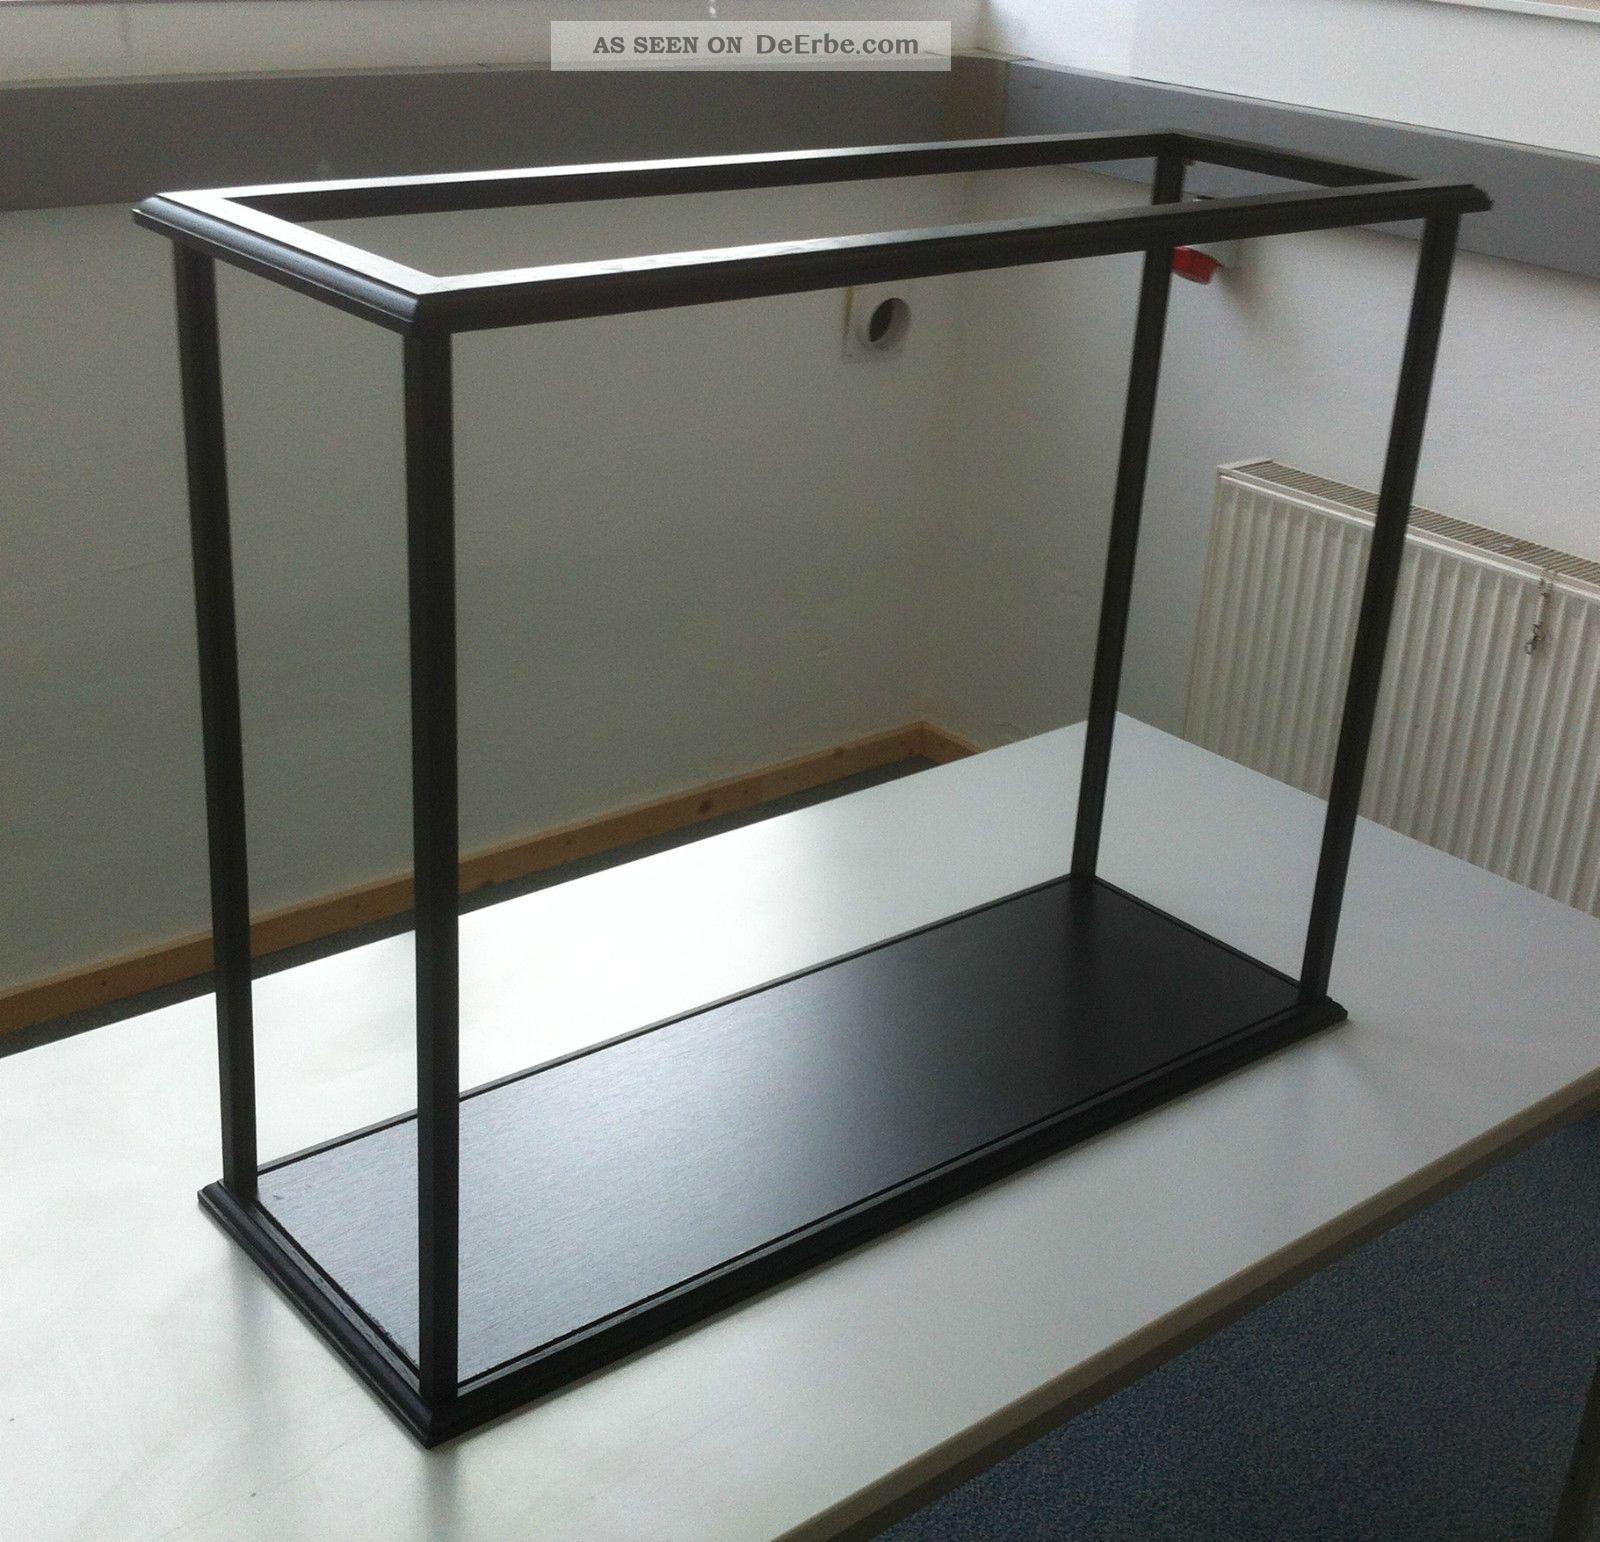 modellvitrine schiffsmodell vitrine schaukasten schiff. Black Bedroom Furniture Sets. Home Design Ideas